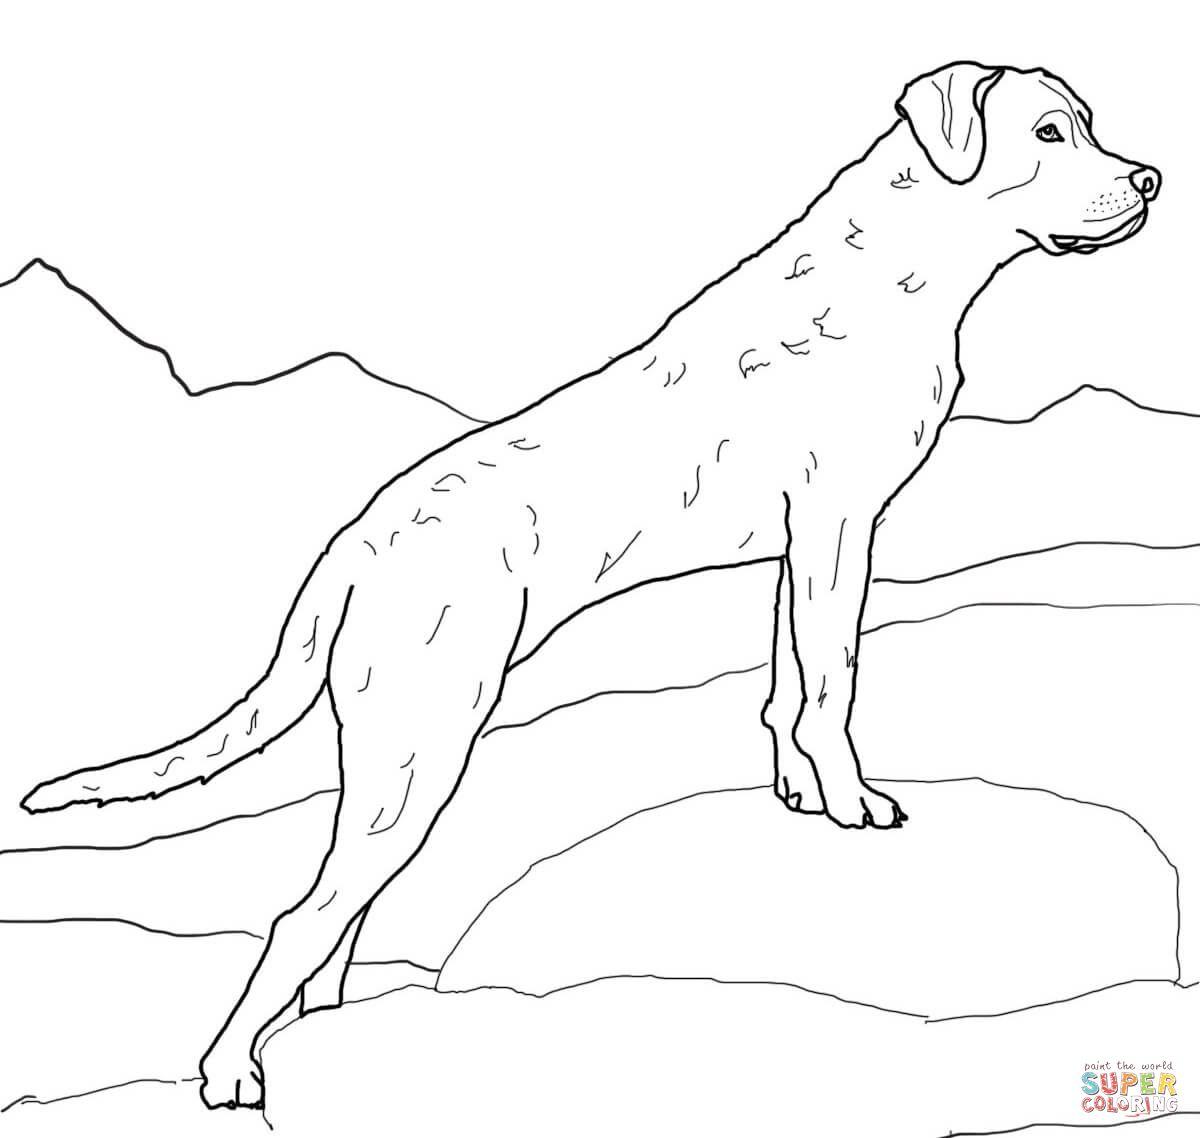 Chesapeake Bay Retriever Dog Coloring Page Puppy Coloring Pages Golden Retriever Colors [ 1138 x 1200 Pixel ]